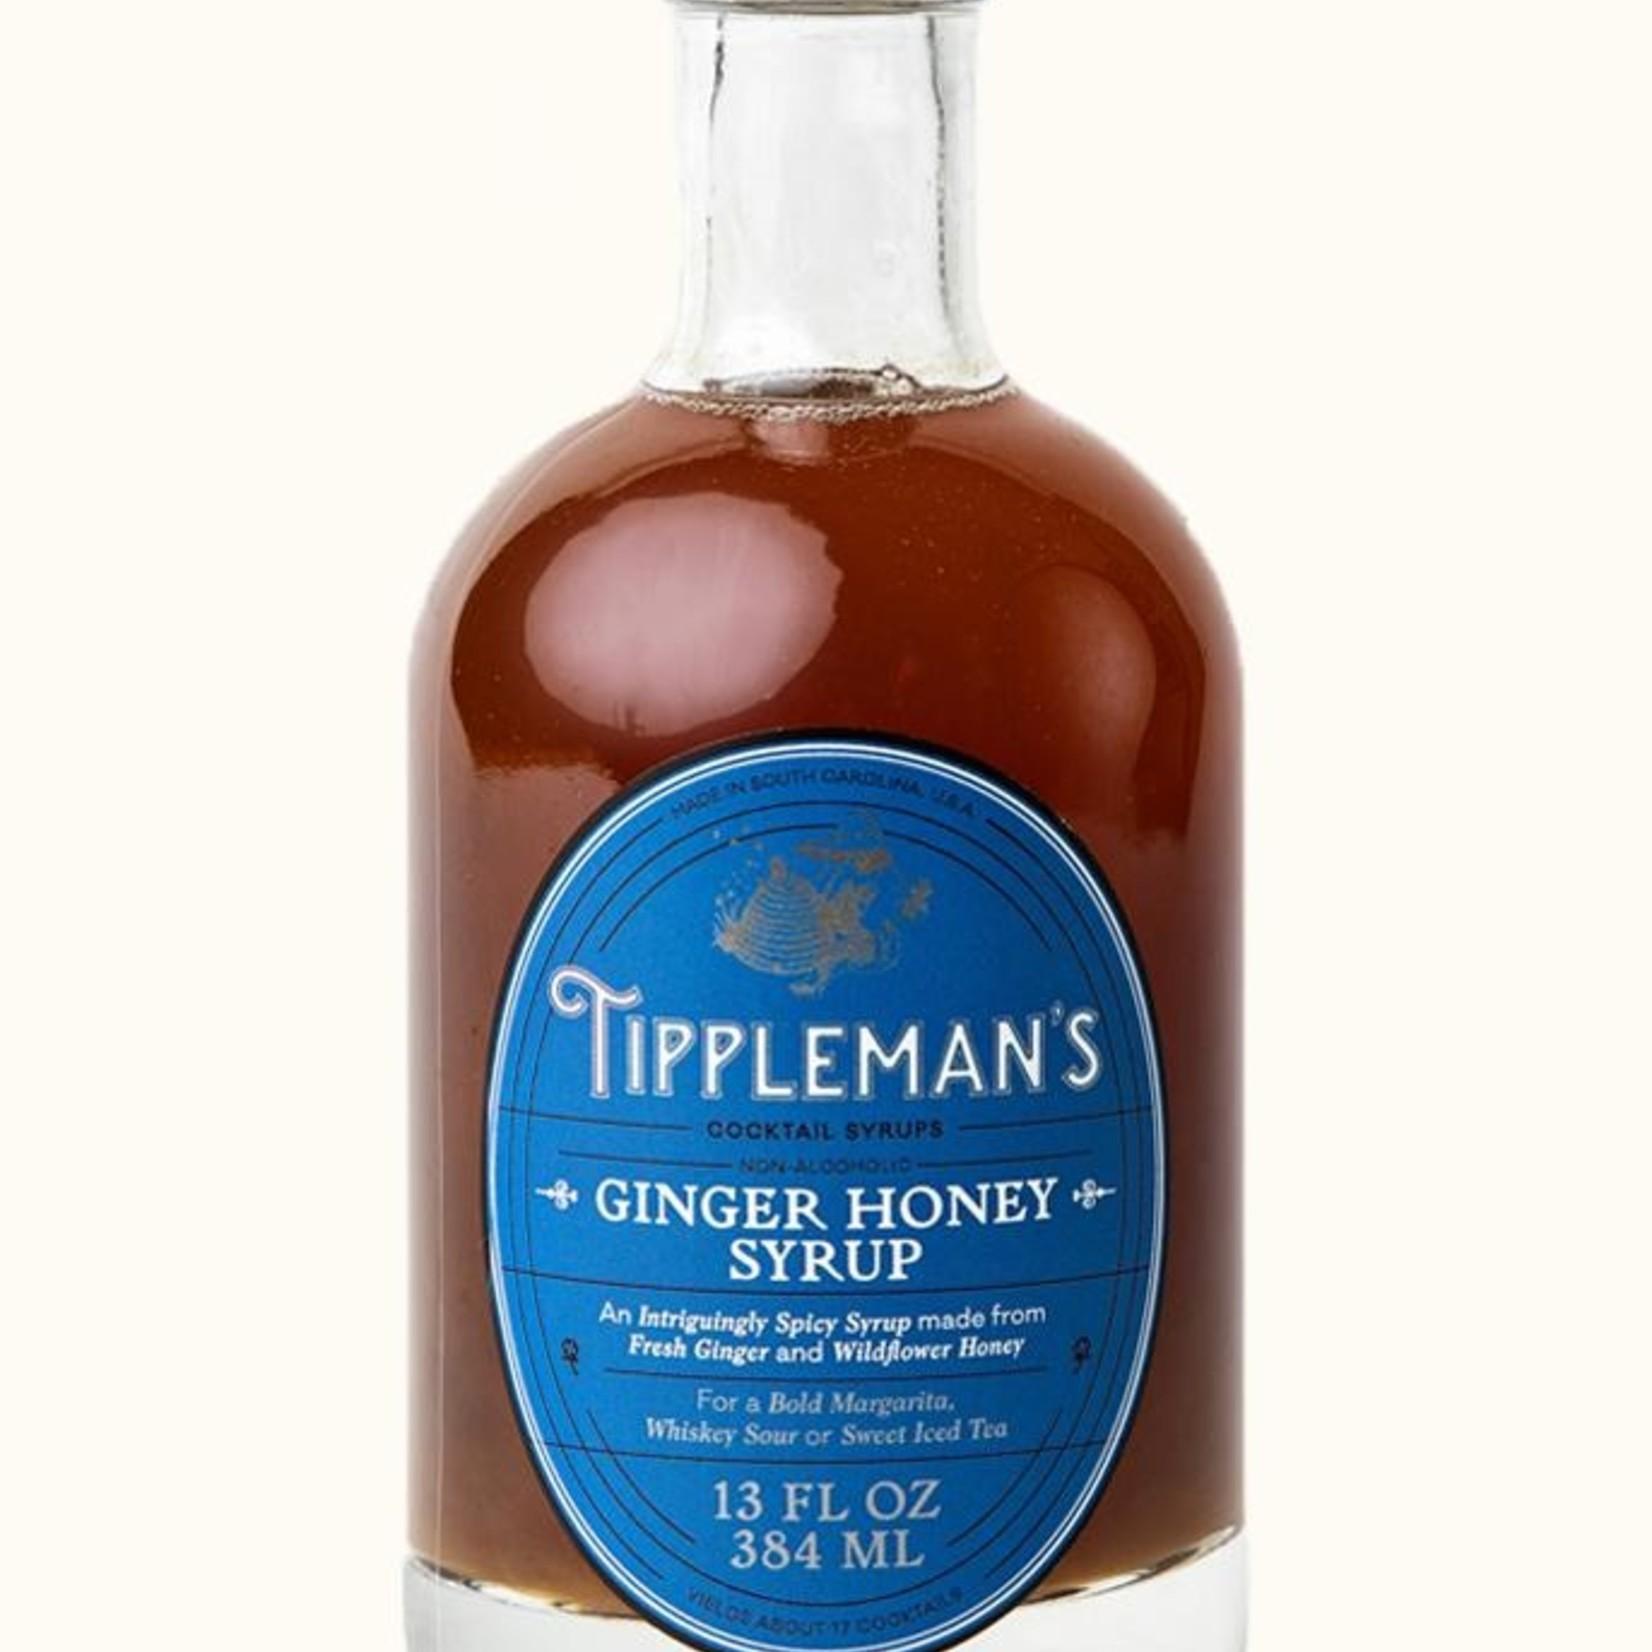 Tippleman's Ginger Honey Syrup